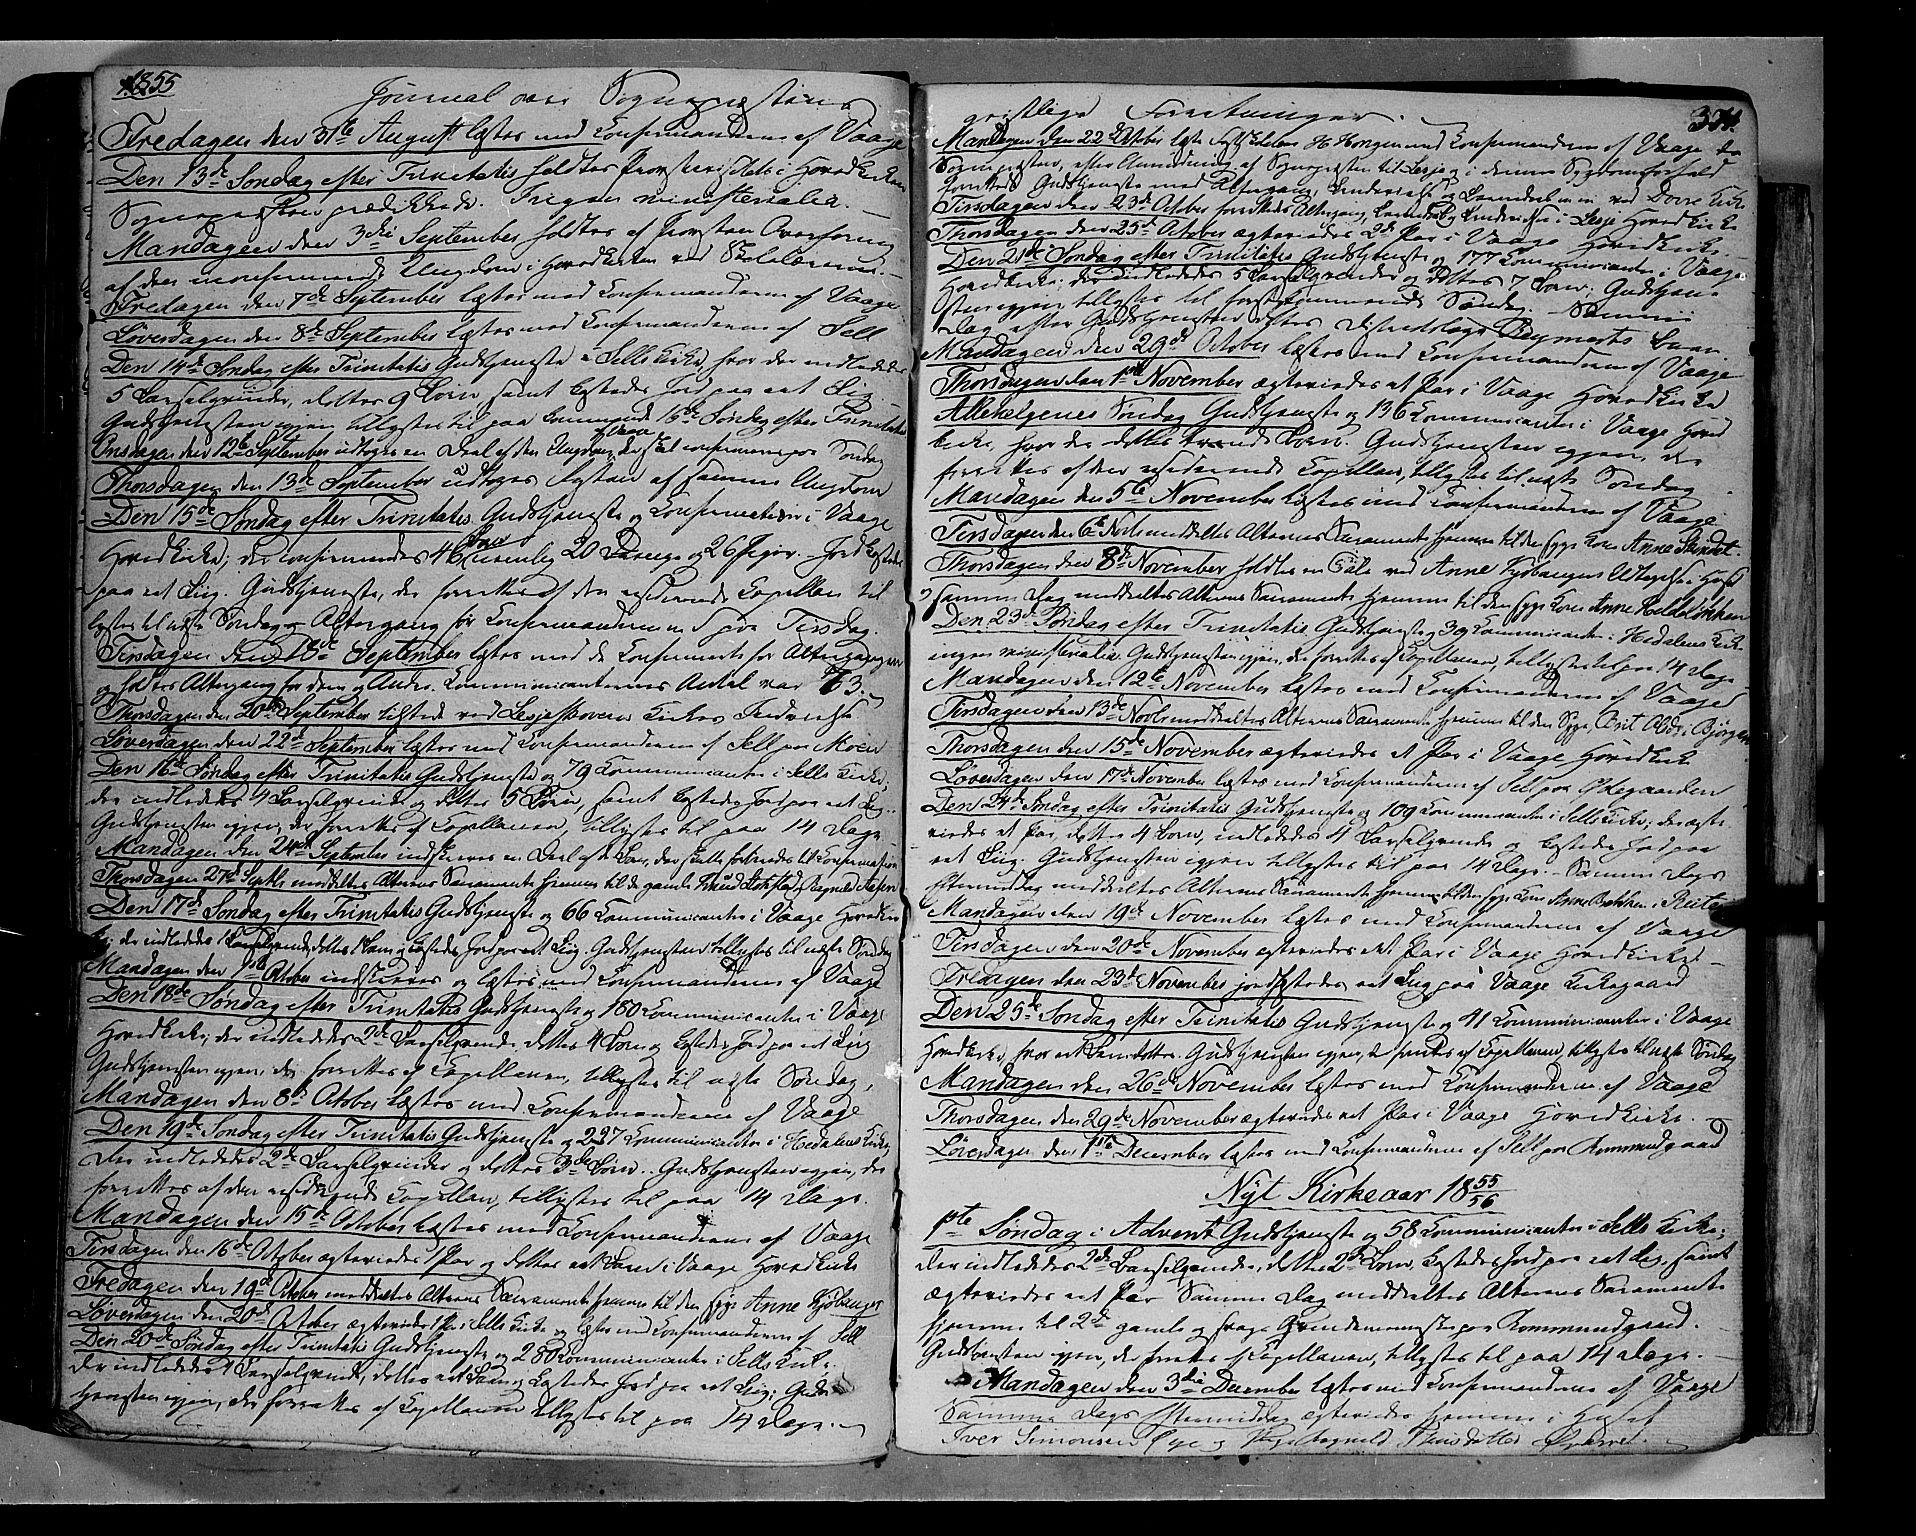 SAH, Vågå prestekontor, Ministerialbok nr. 5 /1, 1842-1856, s. 371